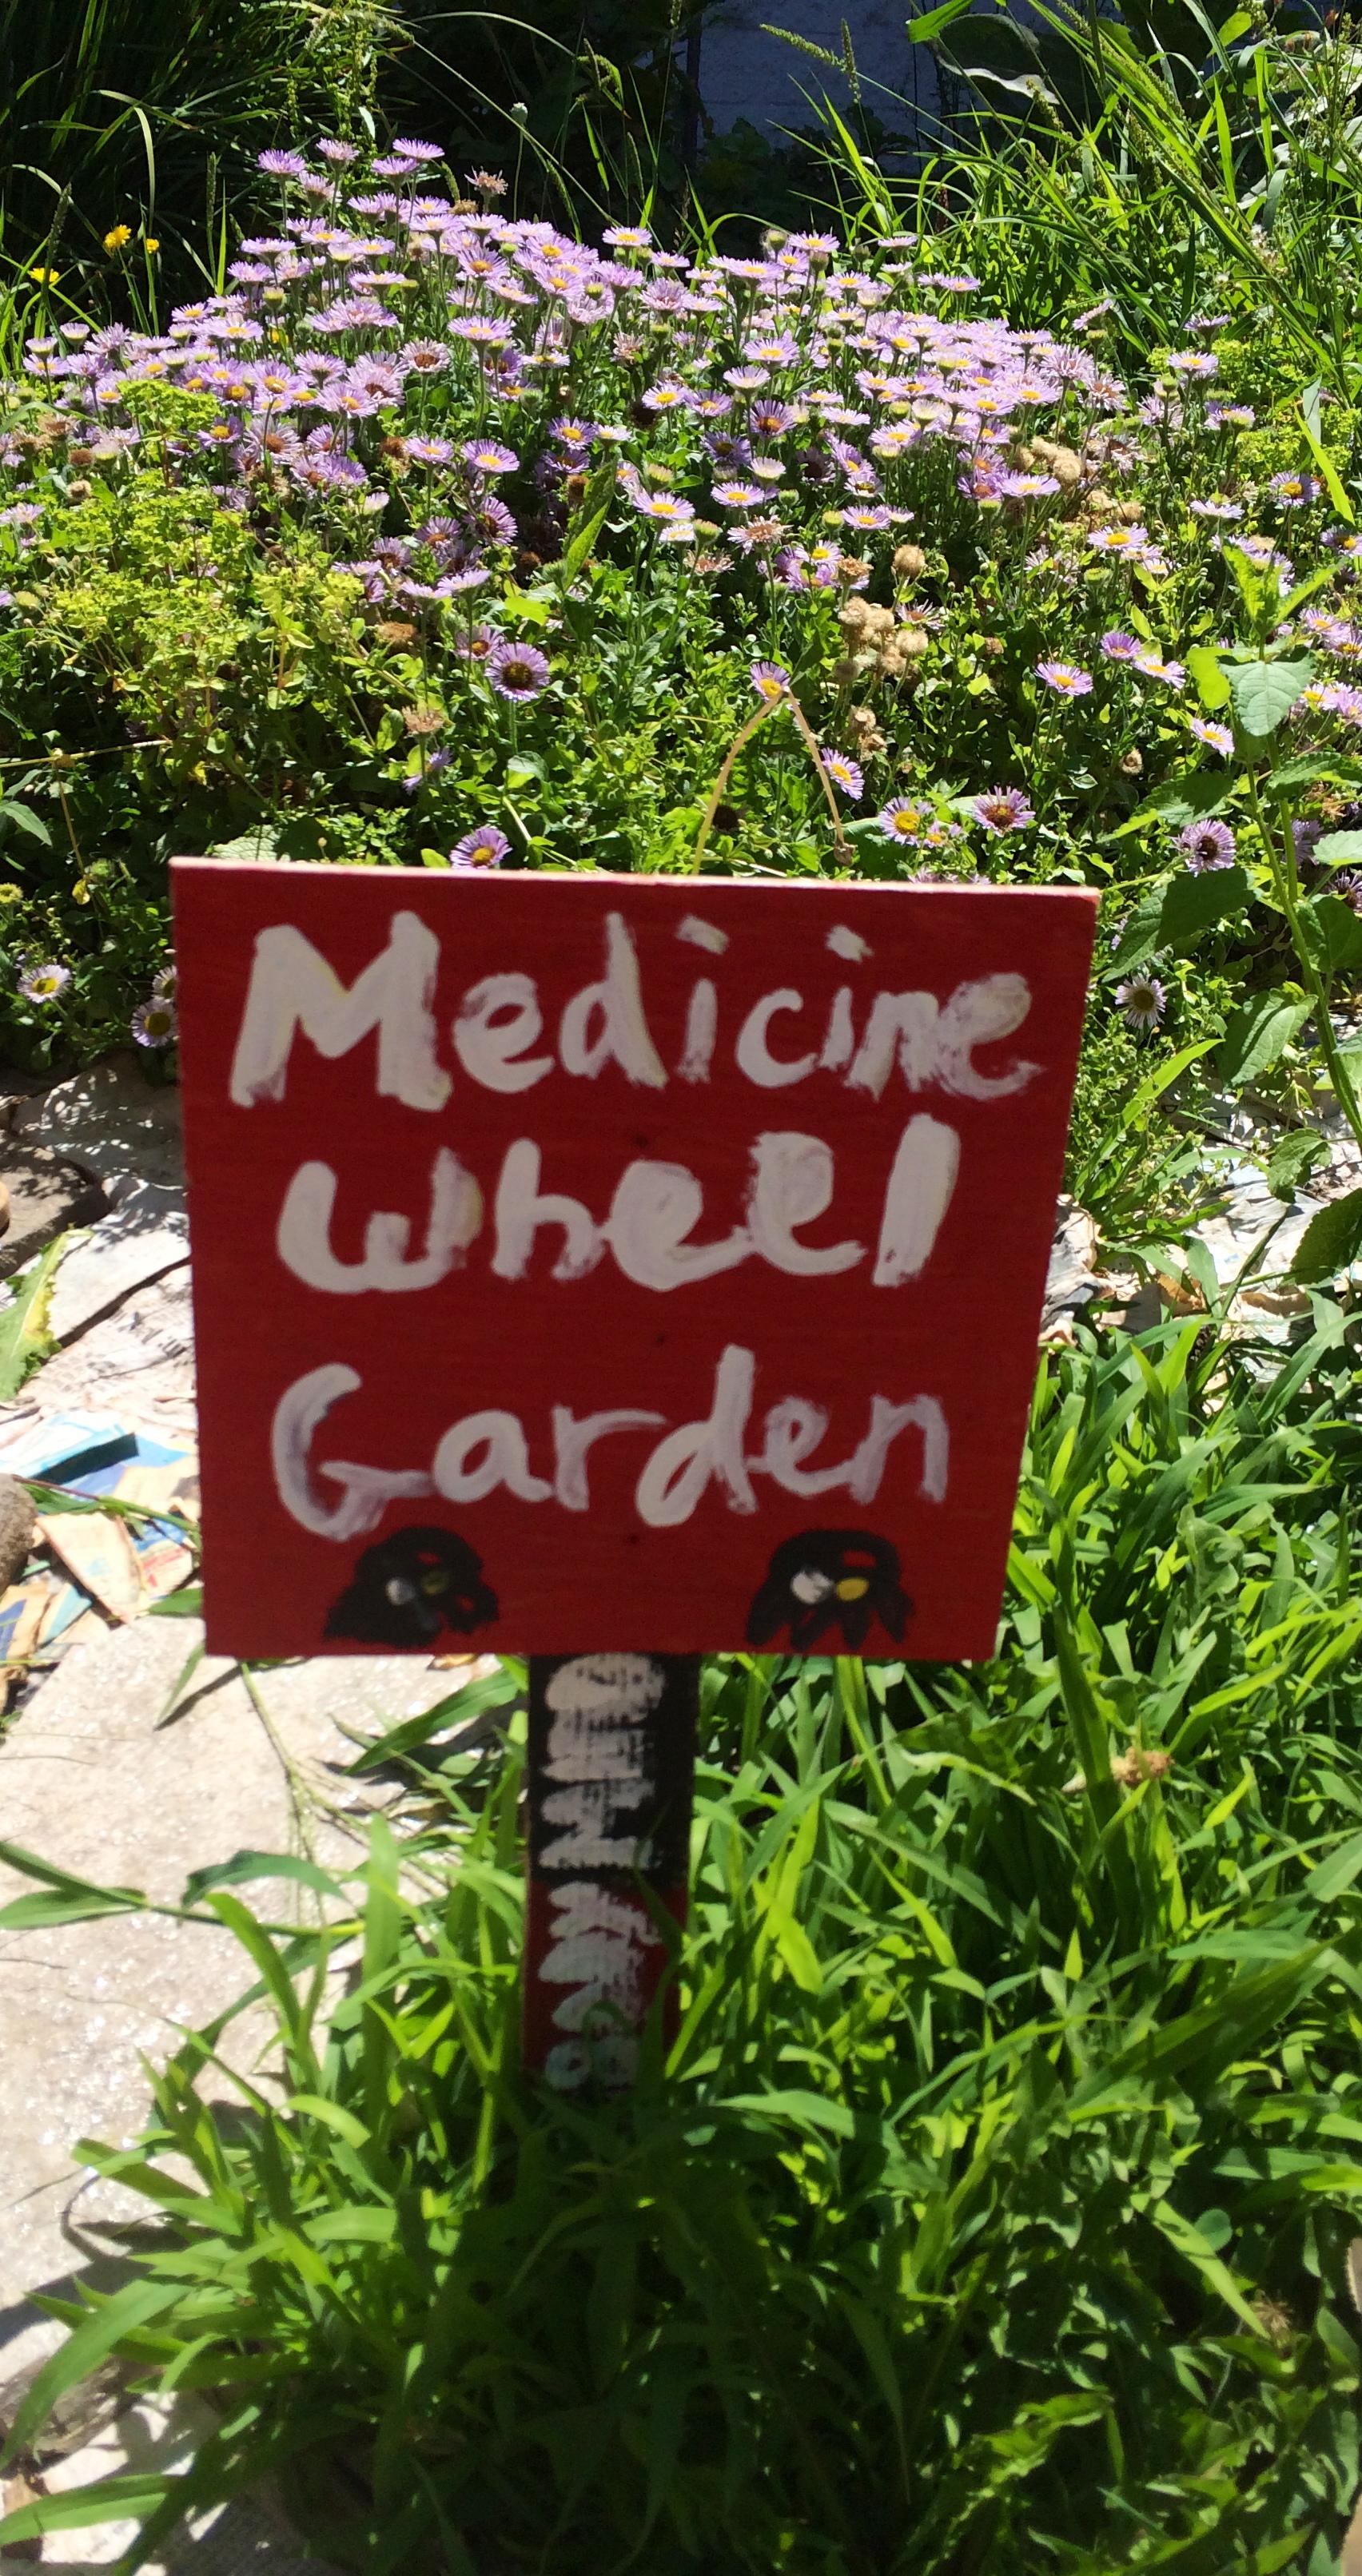 Native America Youth and Family Center NAYA Indigenous Gardens – Medicine Wheel Garden Plans